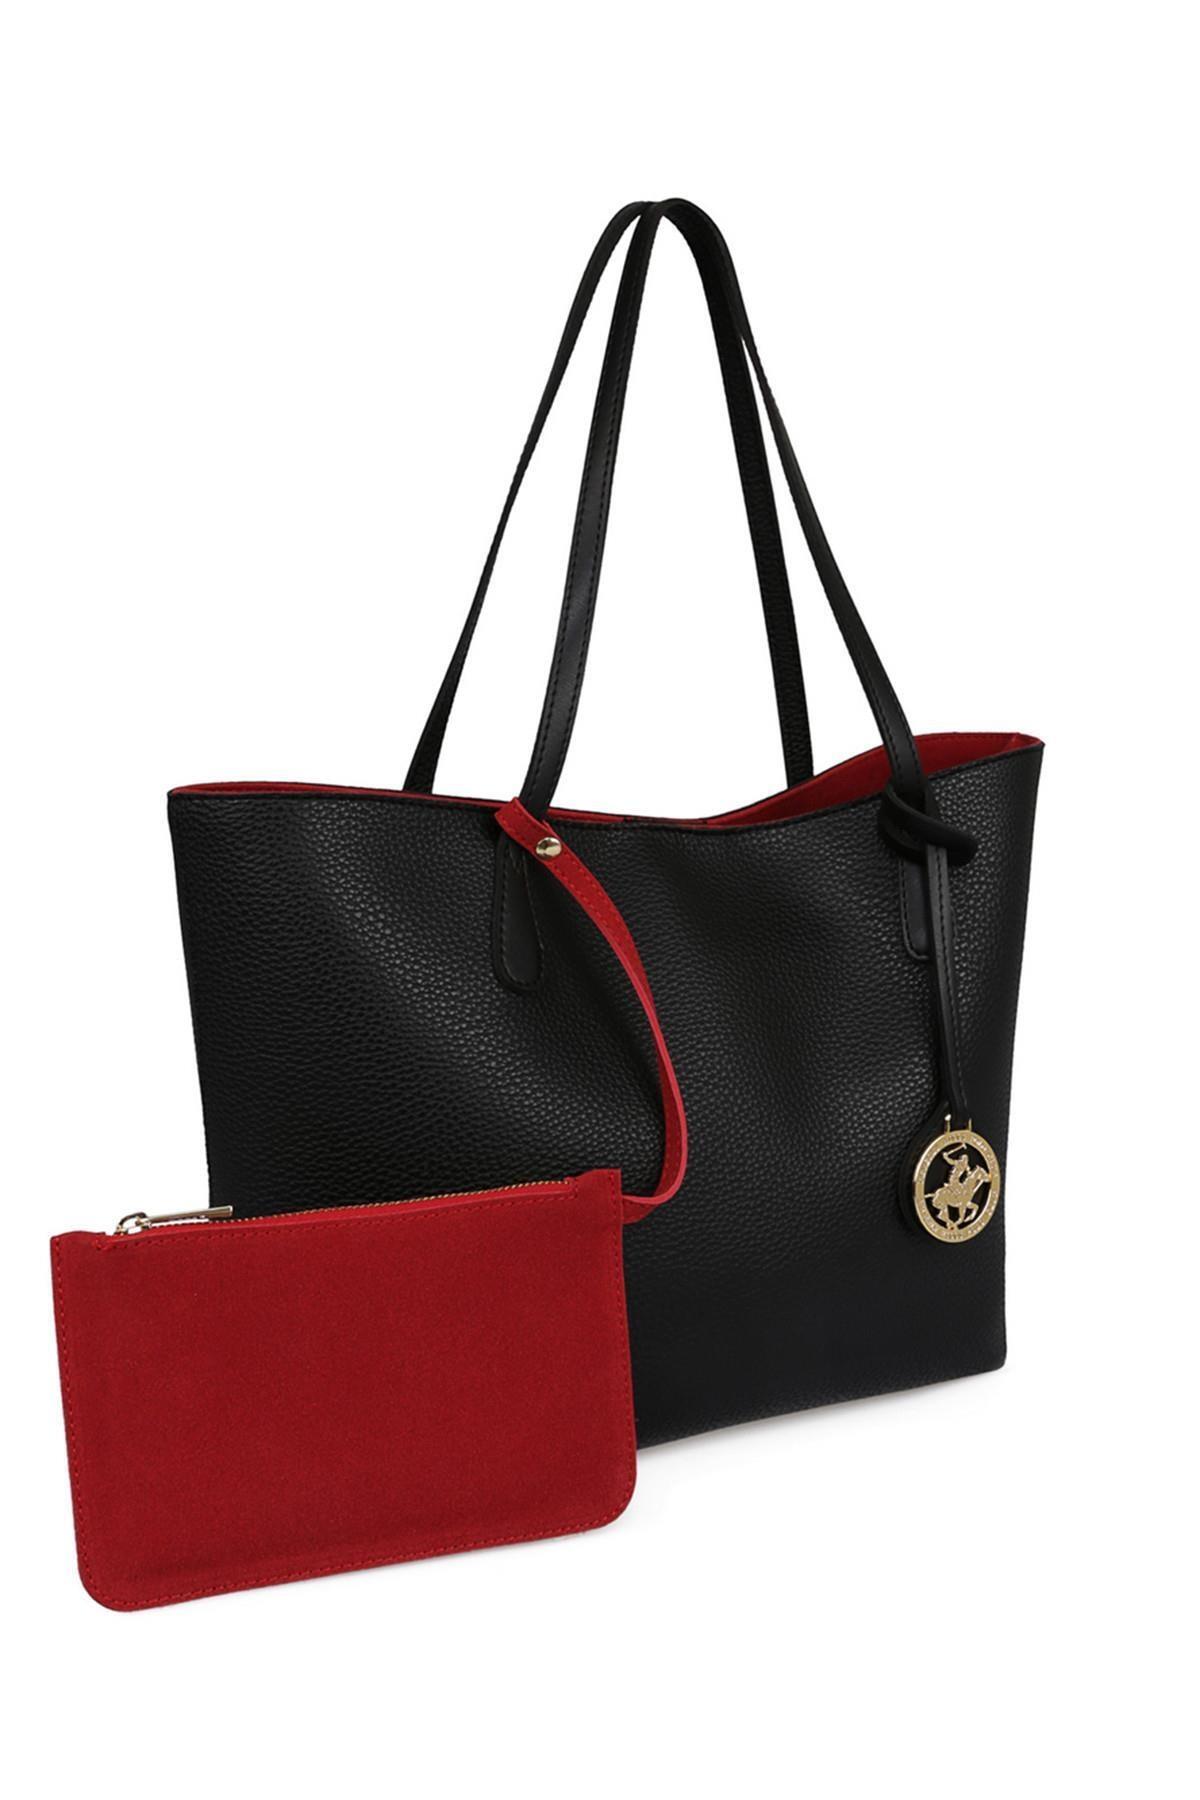 Beverly Hills Polo Club Kadın Tote Çanta Siyah, Kırmızı 0